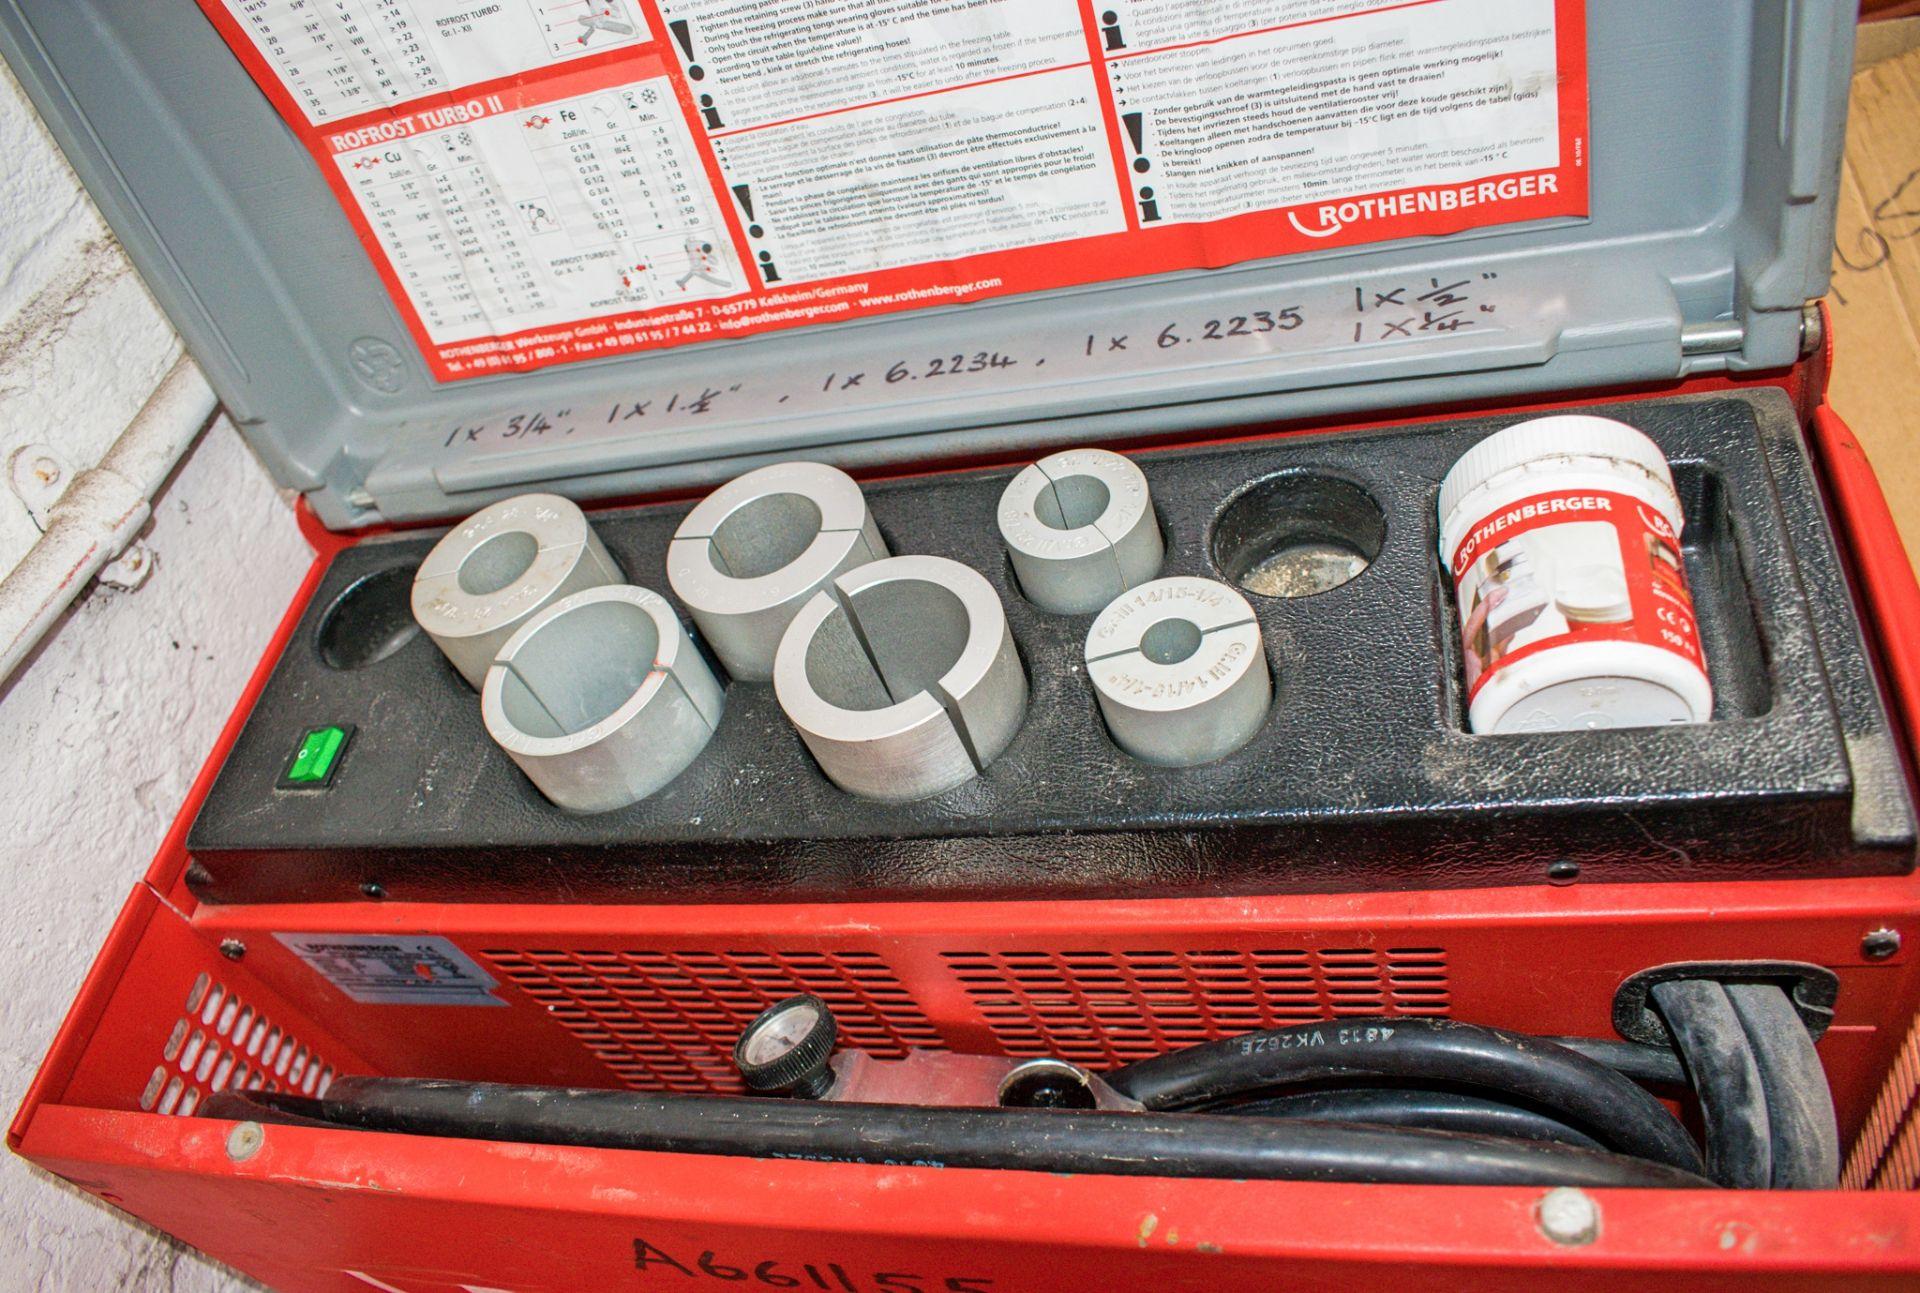 Lot 427 - Rothenberger 110v pipe freezing kit A661155